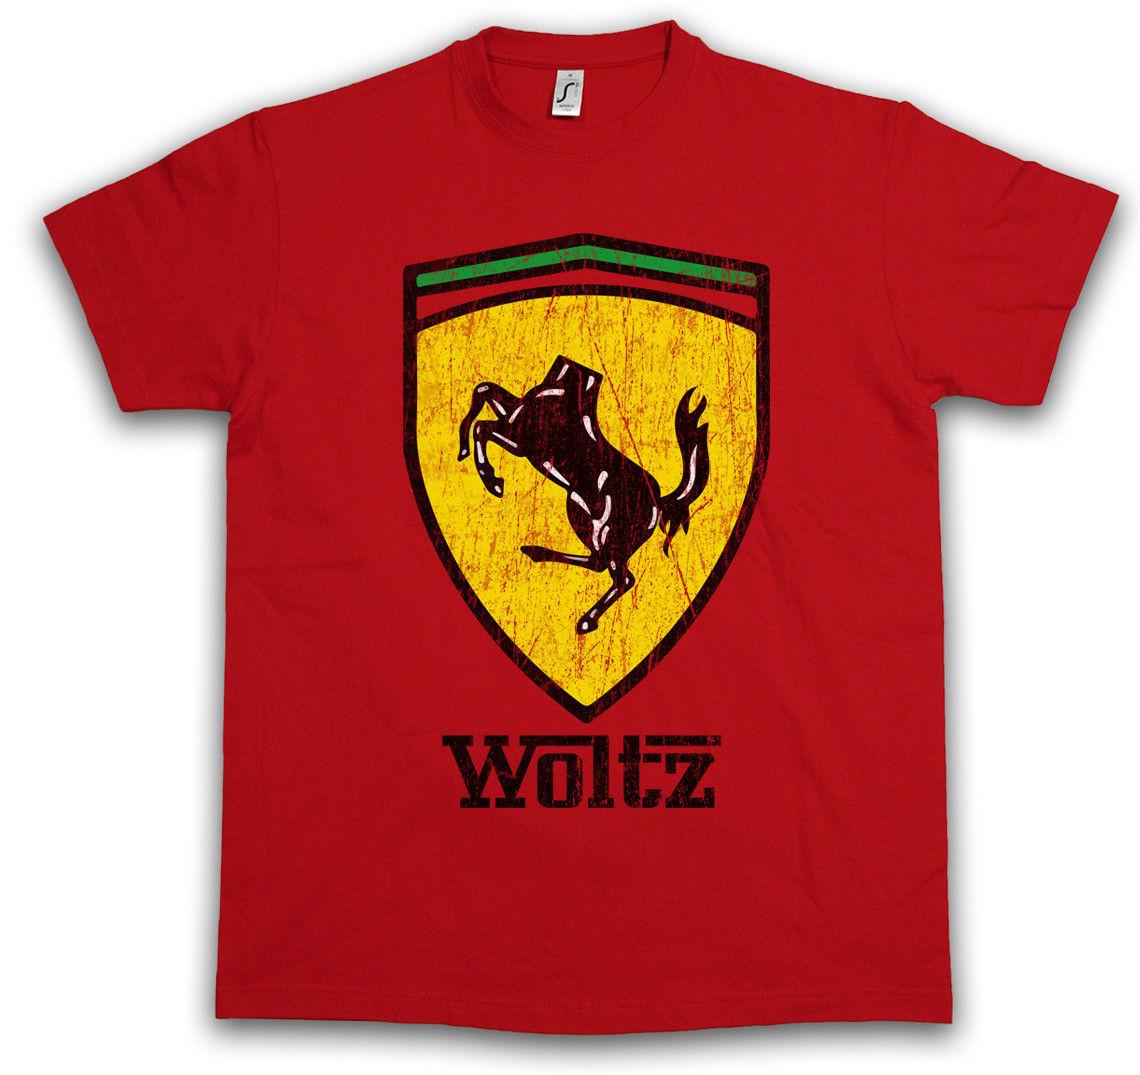 WOLTZ HORSE T-SHIRT Der The Fun Pate Godfather Horse Head film producer Ferrari Round Neck Men Top Tee